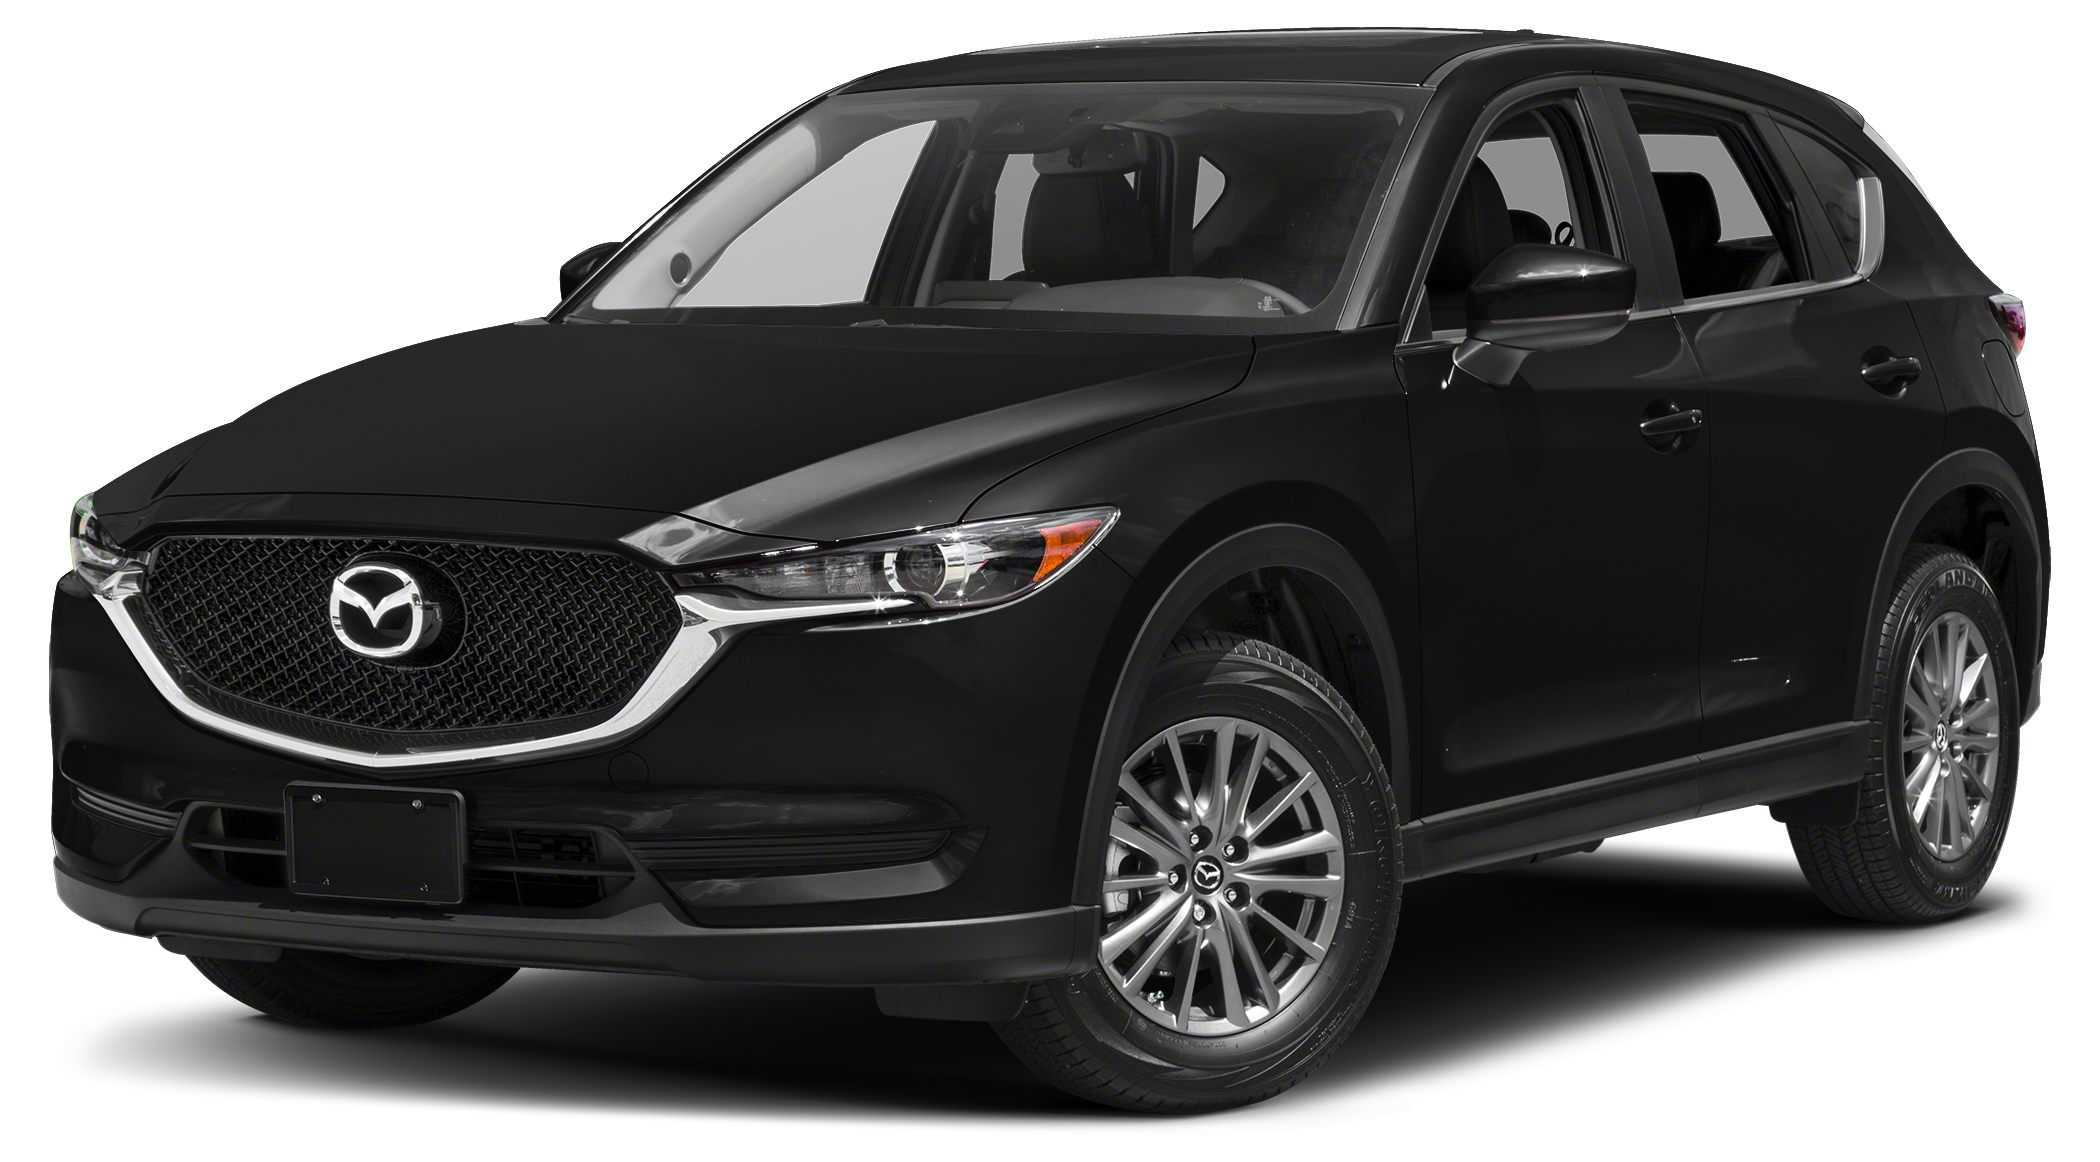 Hiley Mazda Arlington >> 2017 MAZDA CX-5 for sale in Arlington, TX   JM3KFACL5H0123704